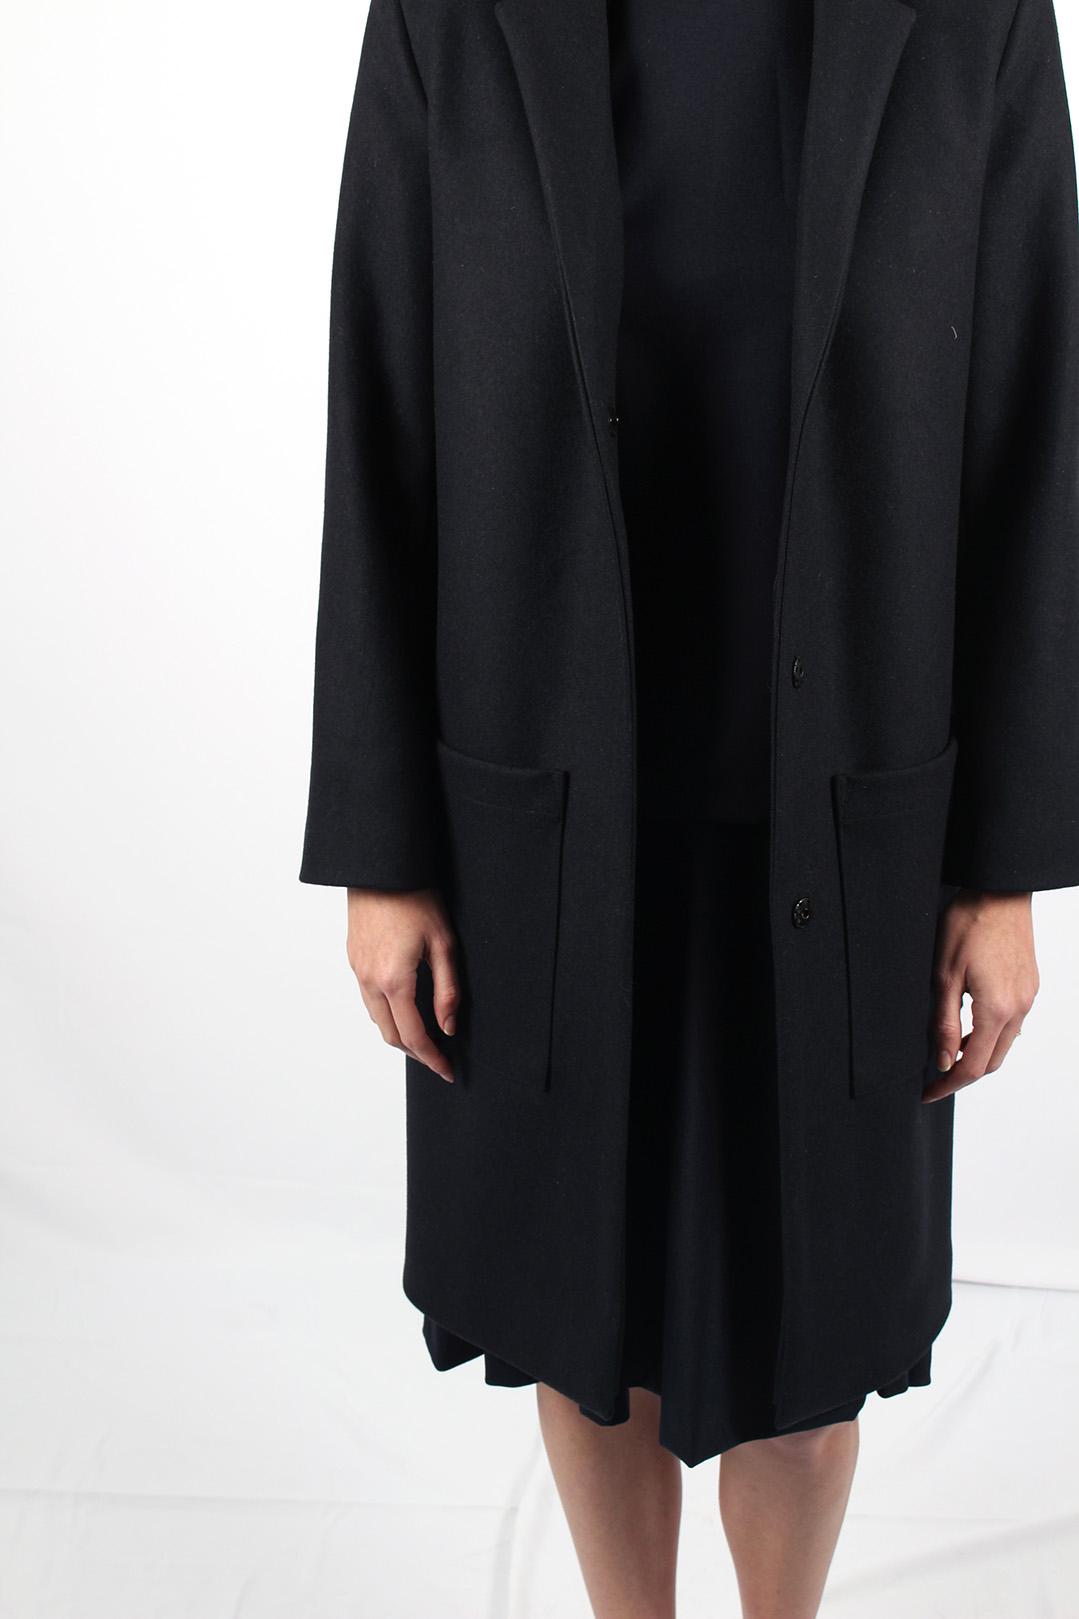 manteau droit femme bleu marine8